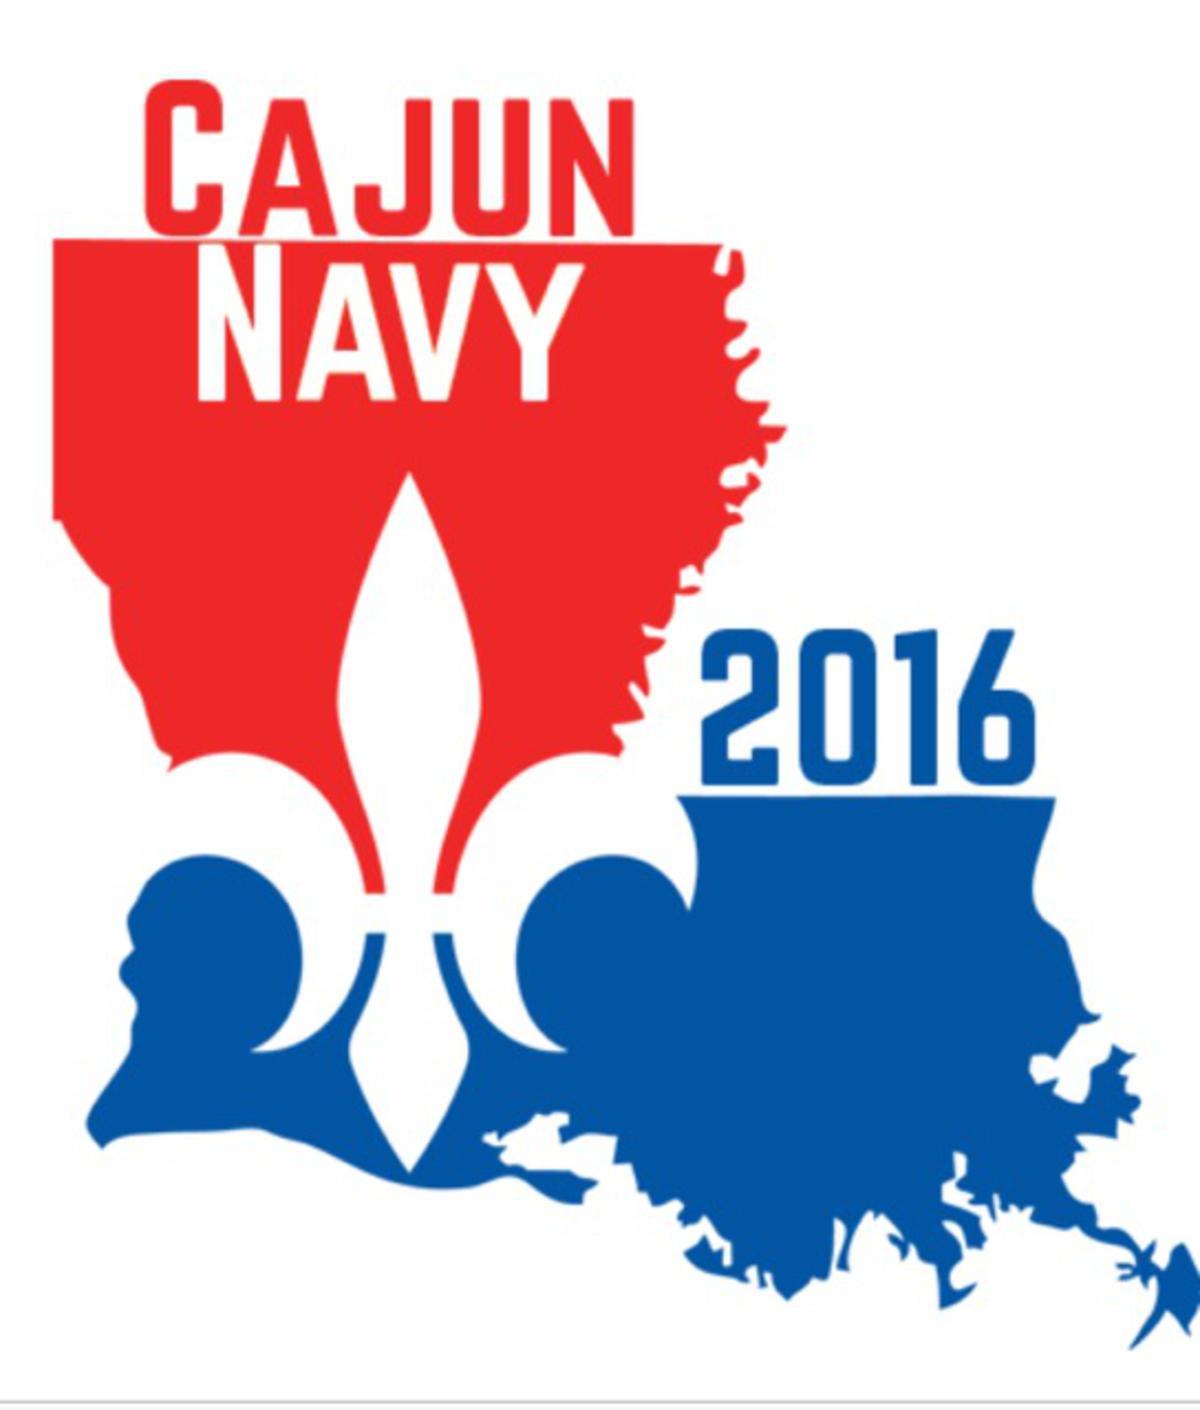 Cajun Navy 2016